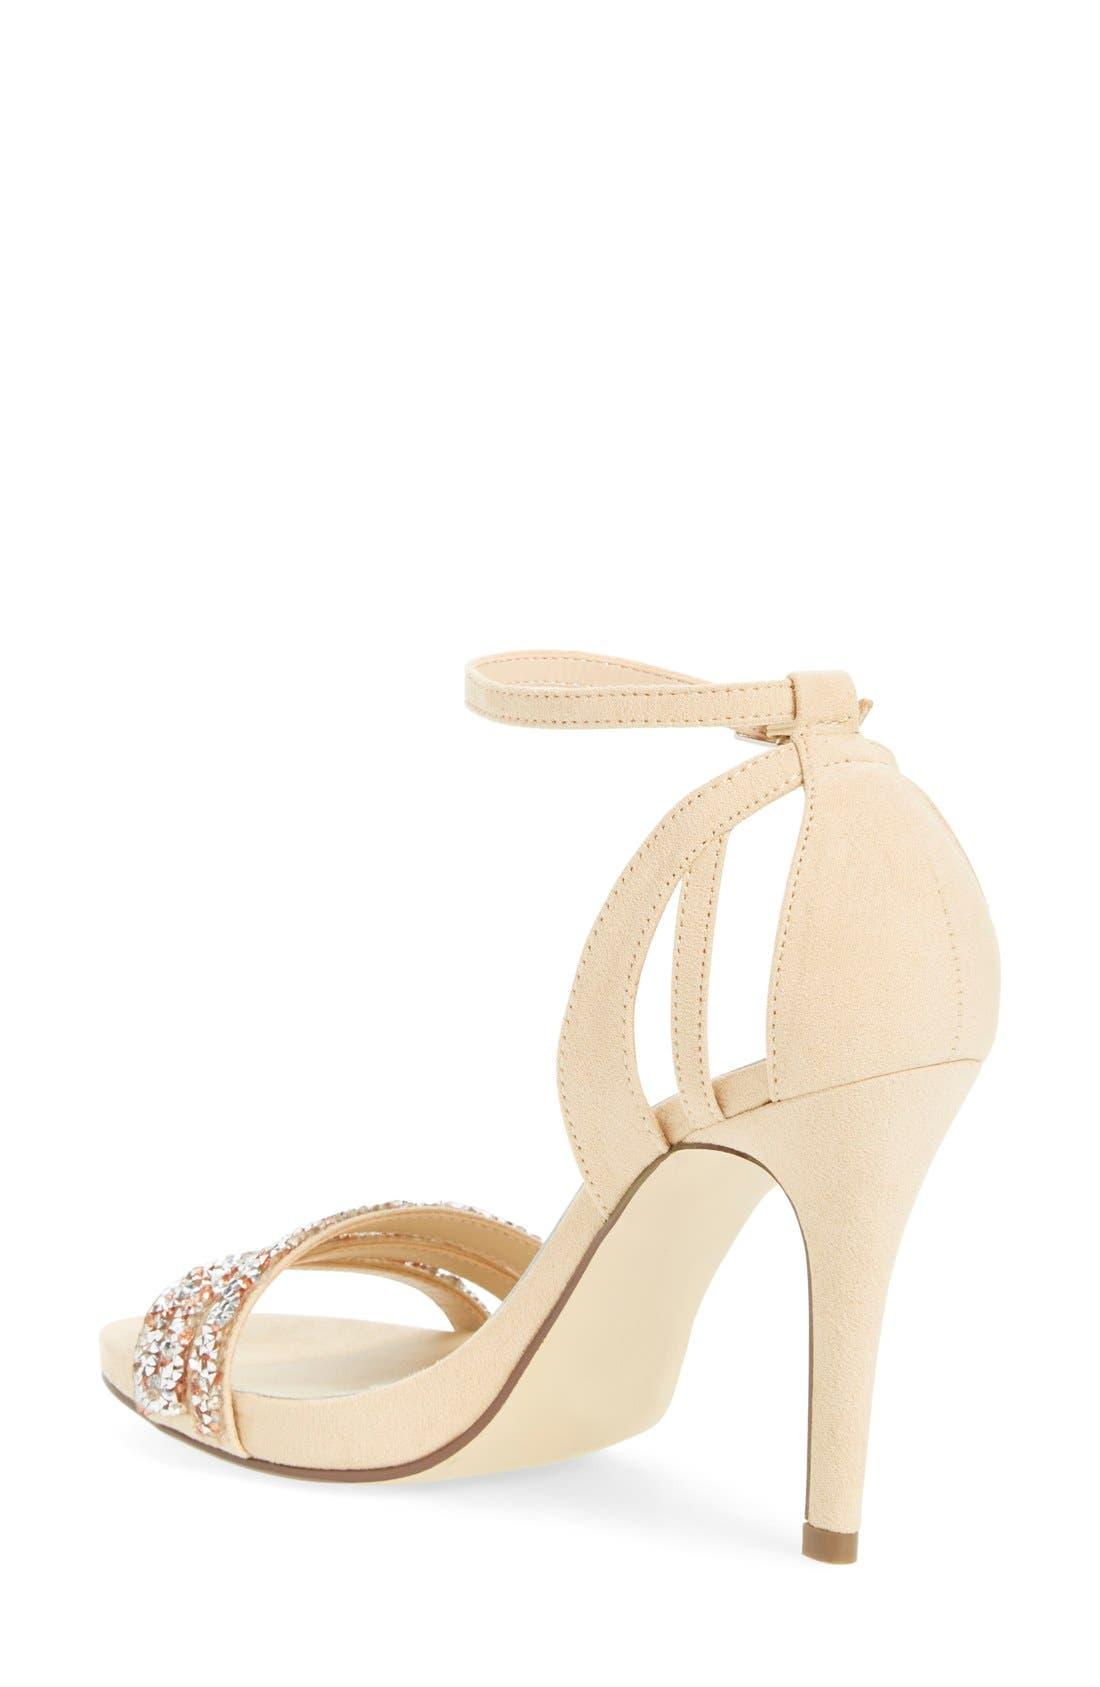 Alternate Image 2  - Menbur 'Pensamiento' Ankle Strap Sandal (Women)